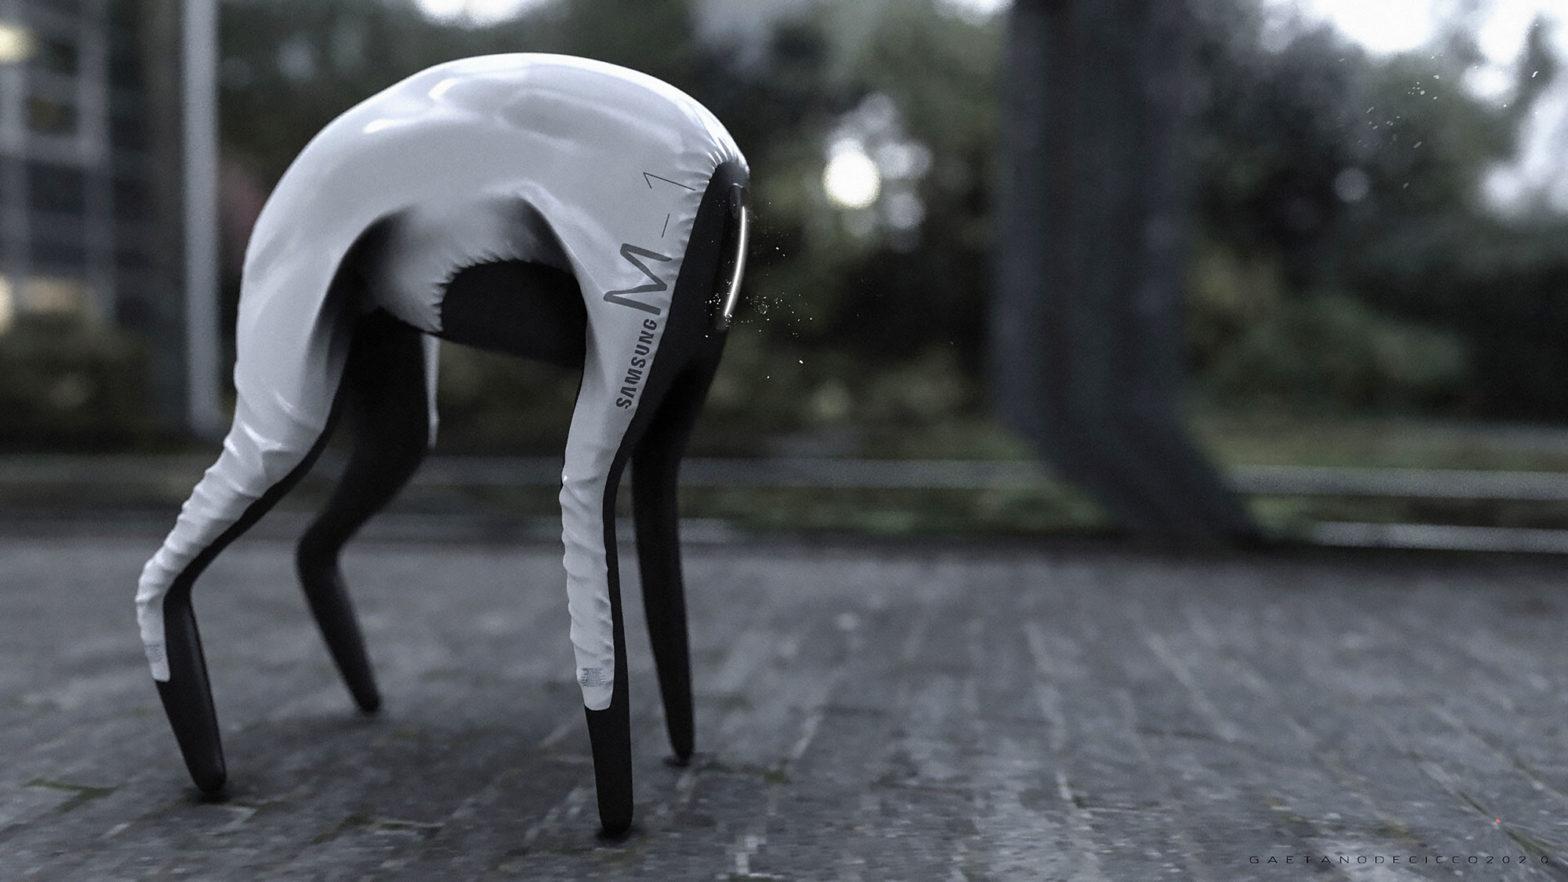 Samsung Prototype Dog-Bot by Gaetano de Cicco